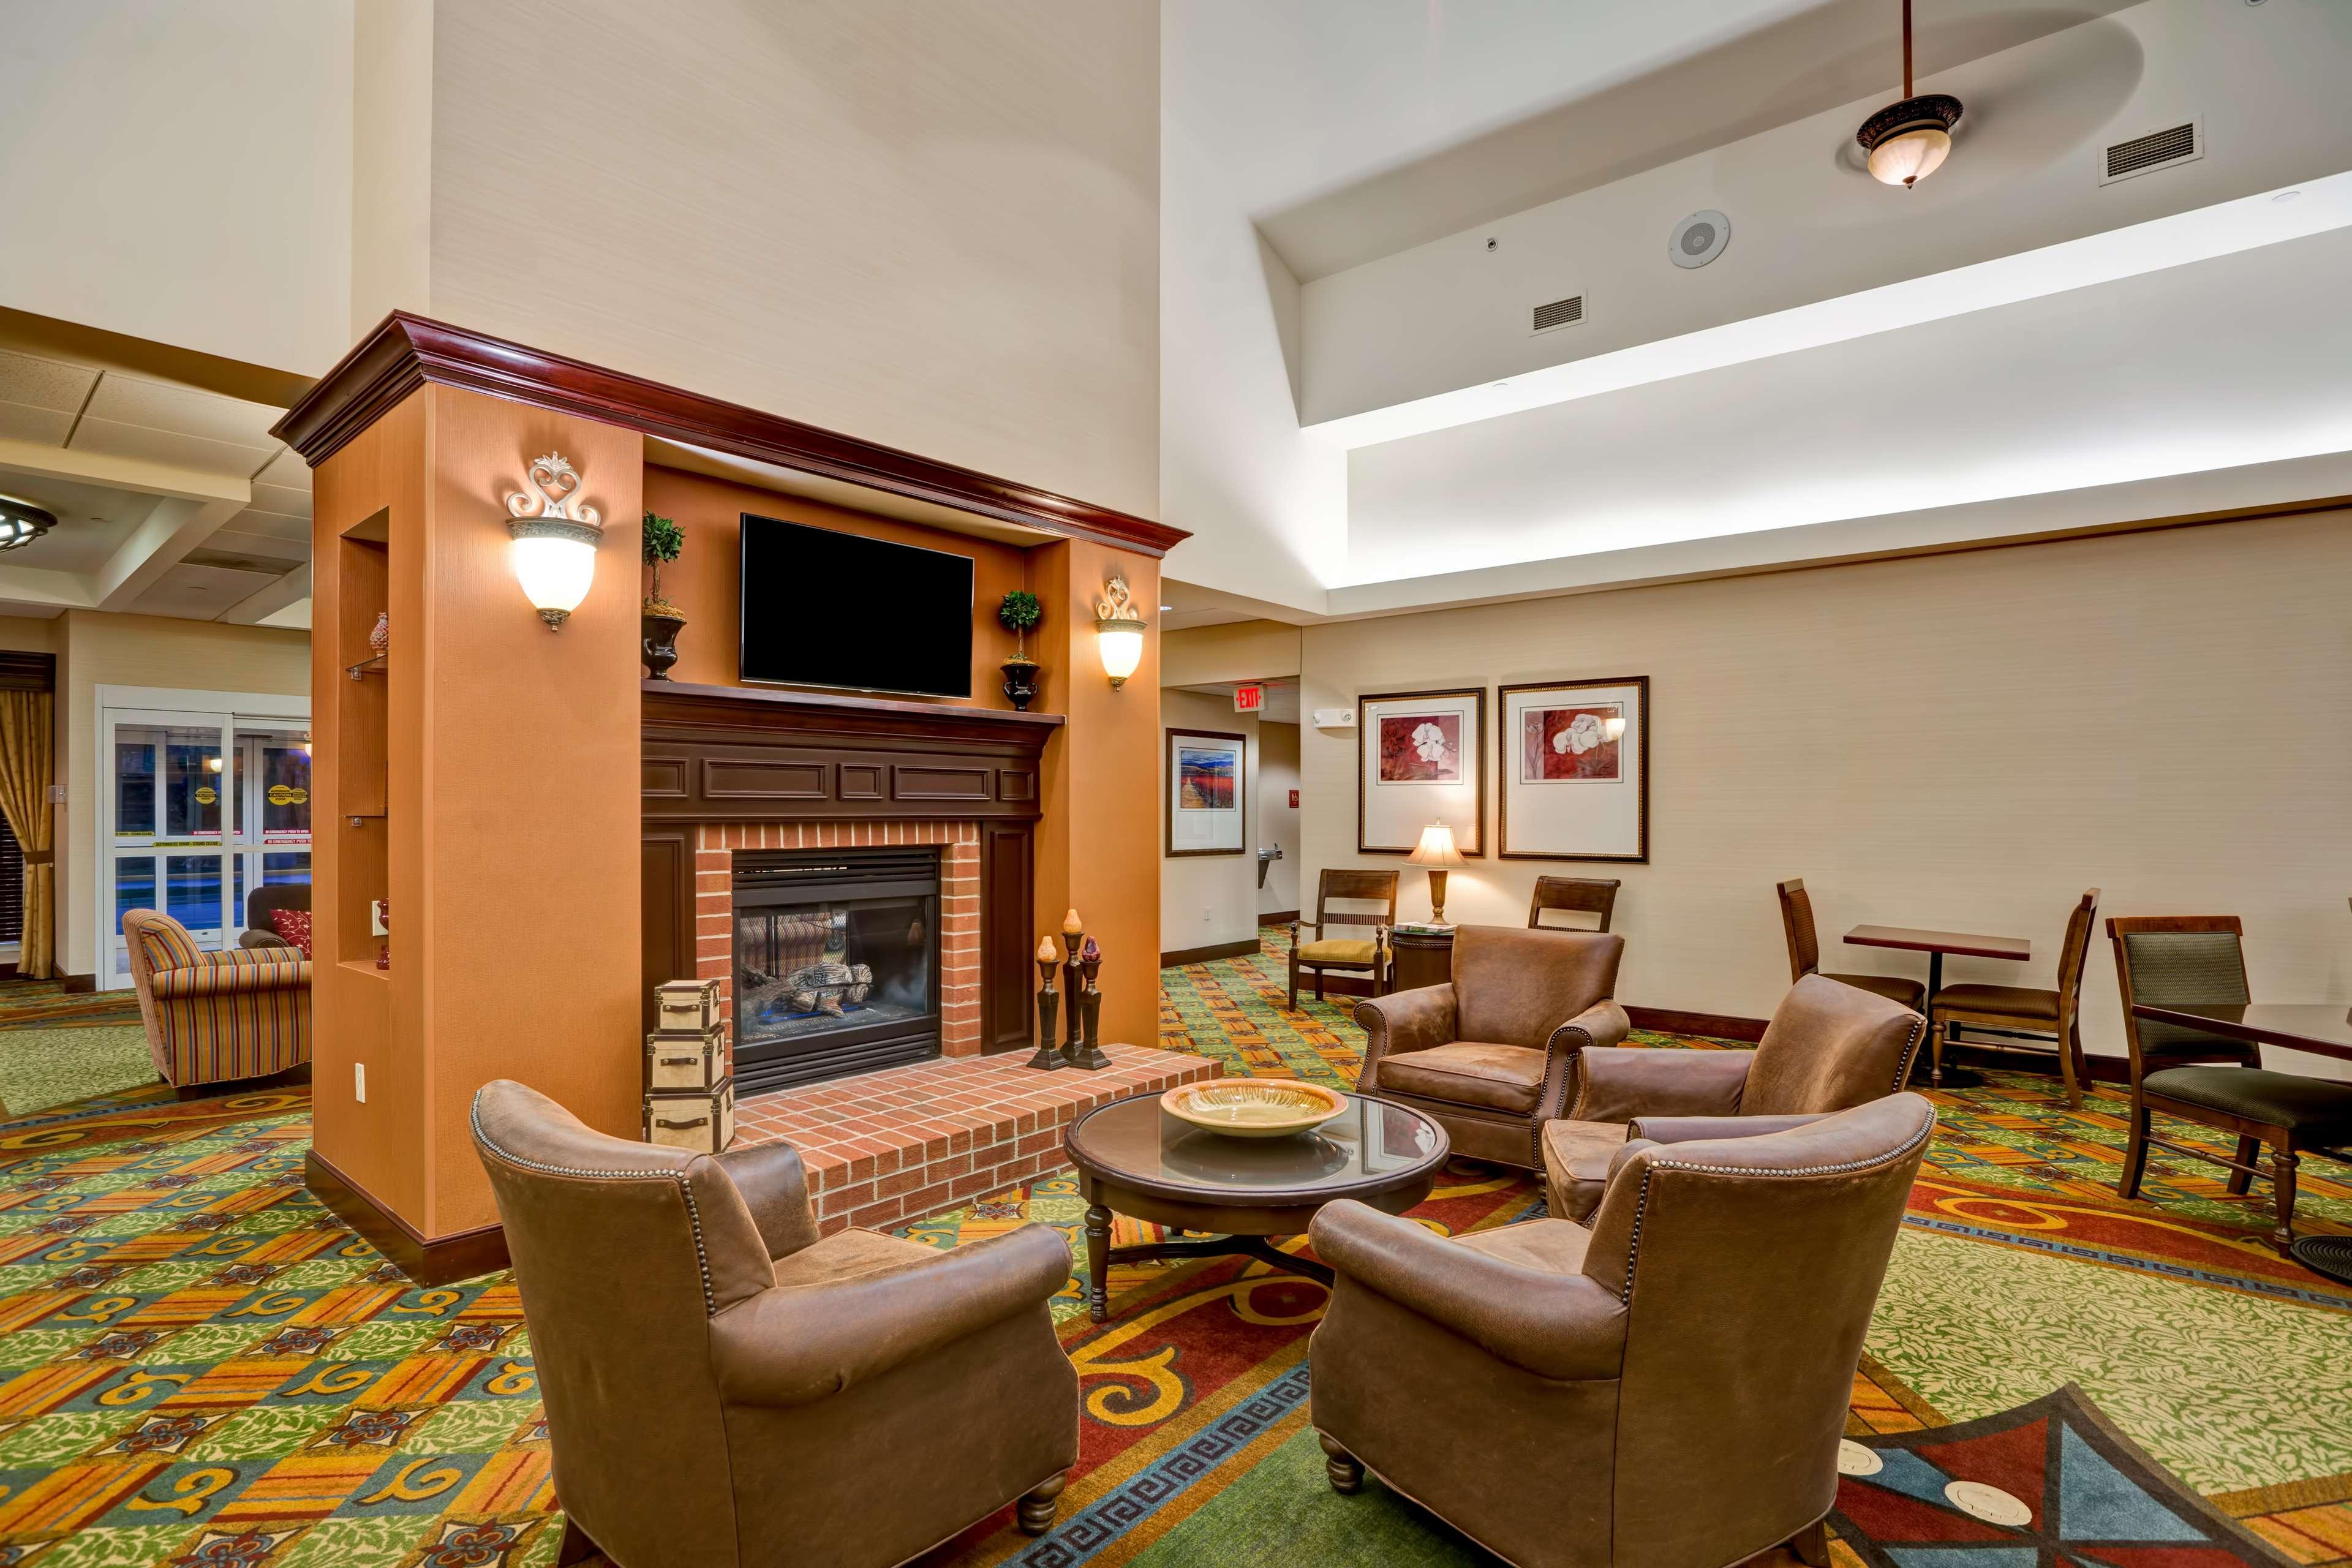 Homewood Suites by Hilton Fredericksburg image 0